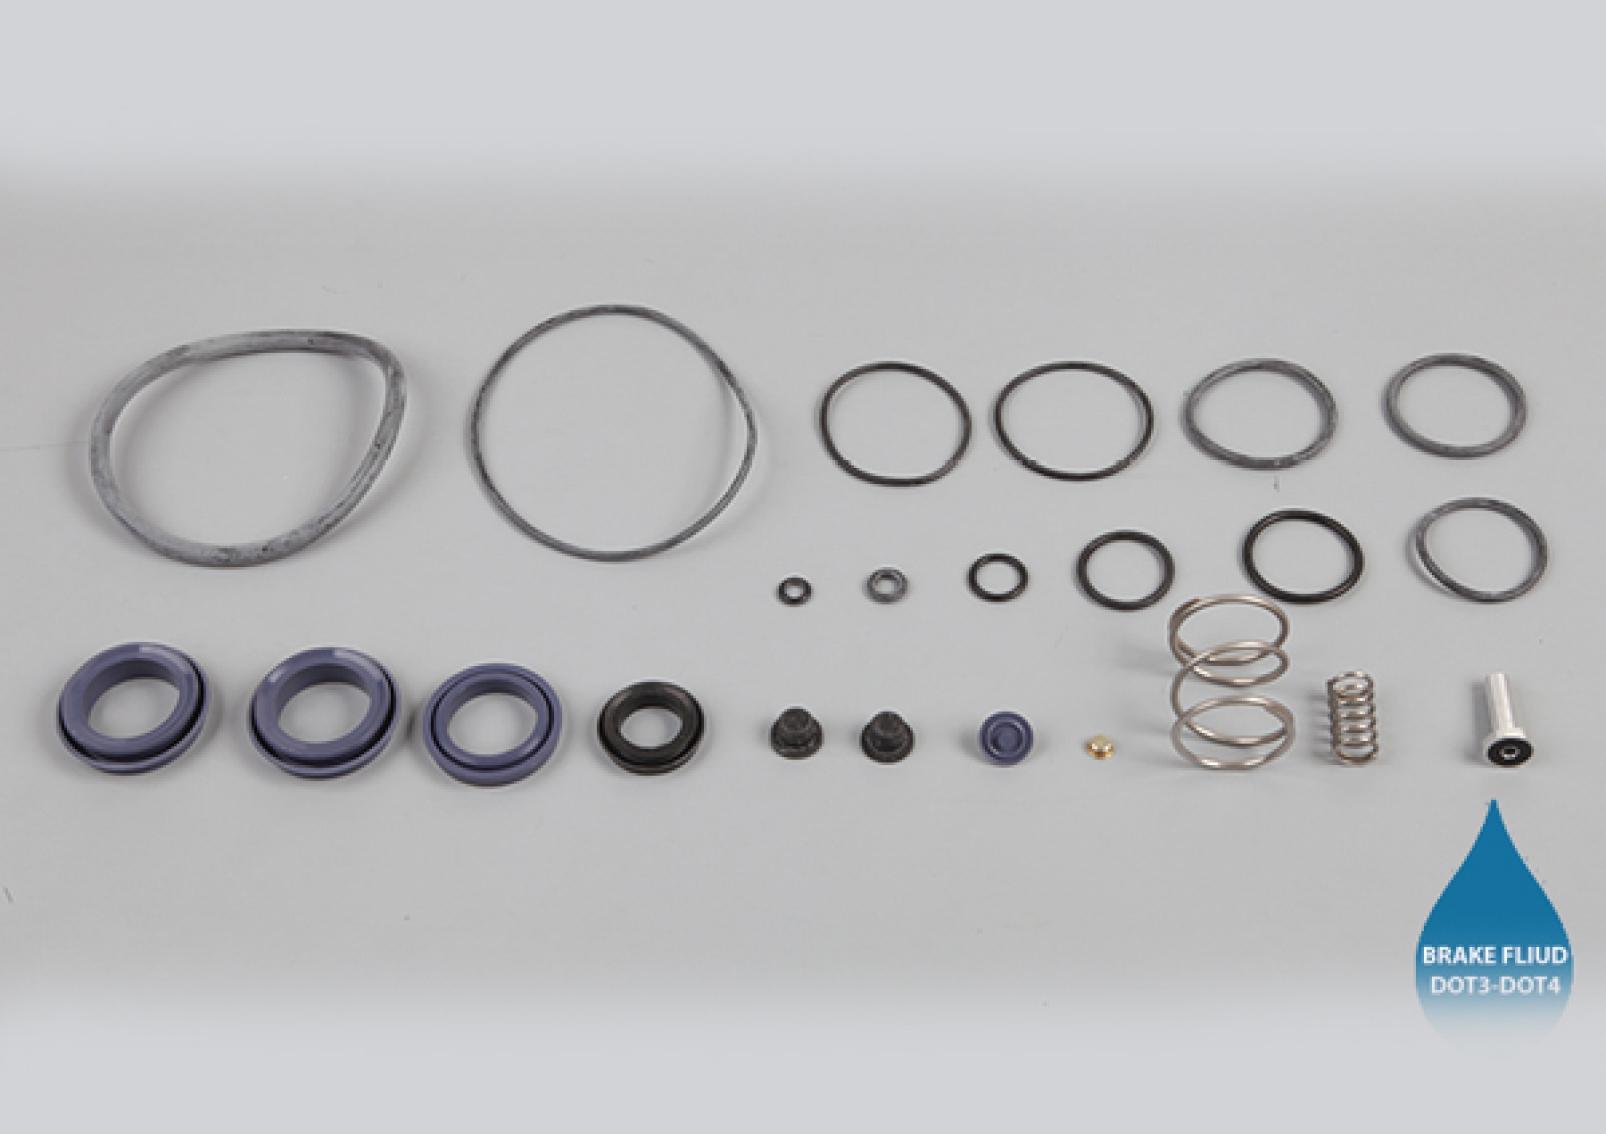 Clutch Servo Repair Kit for Mercedes Benz Axor, Actros,  321 027 001, 321027001